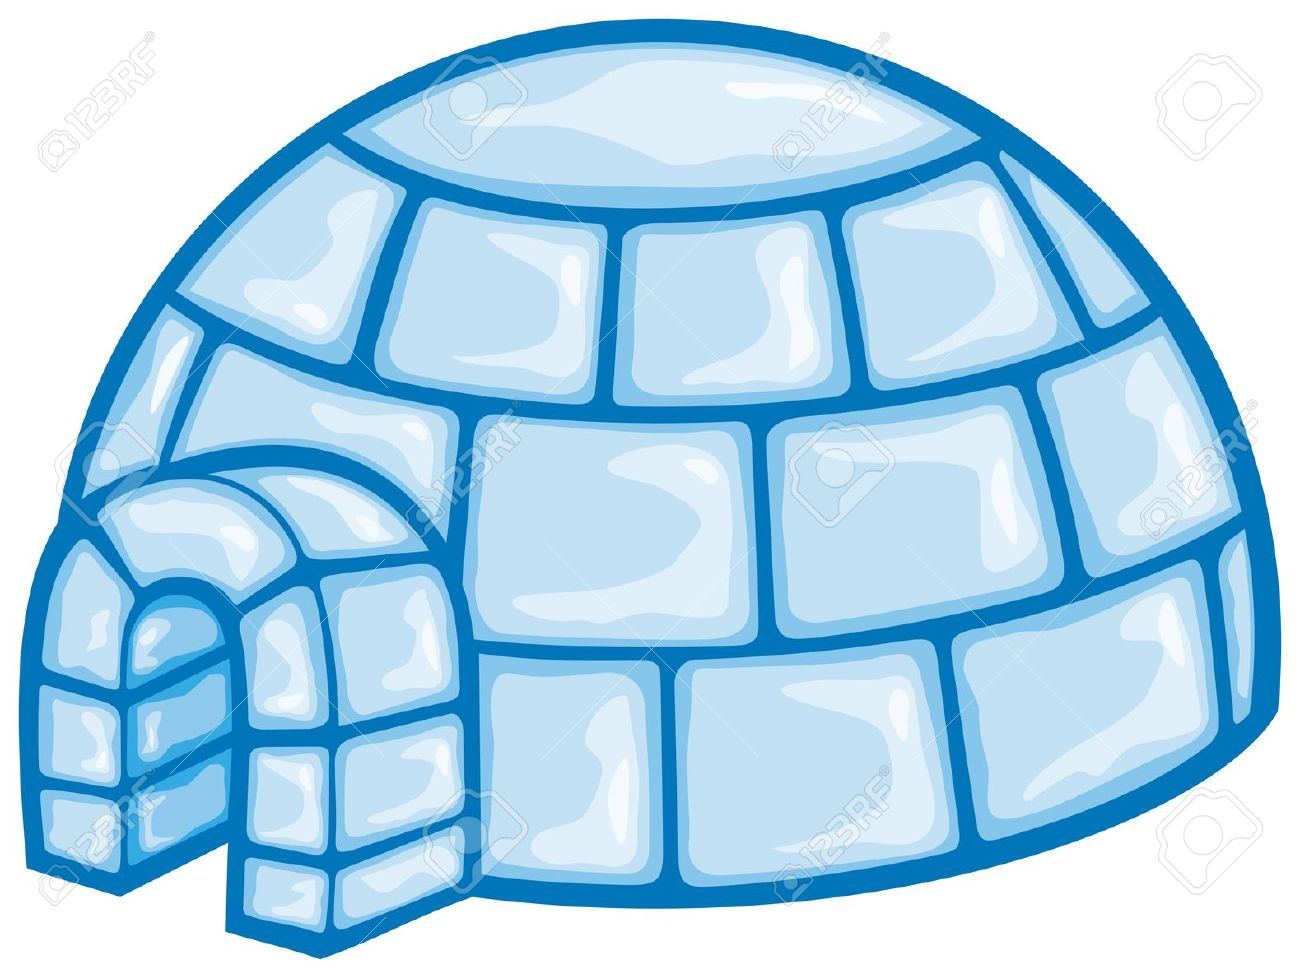 hight resolution of igloo cartoon related keywords clip art